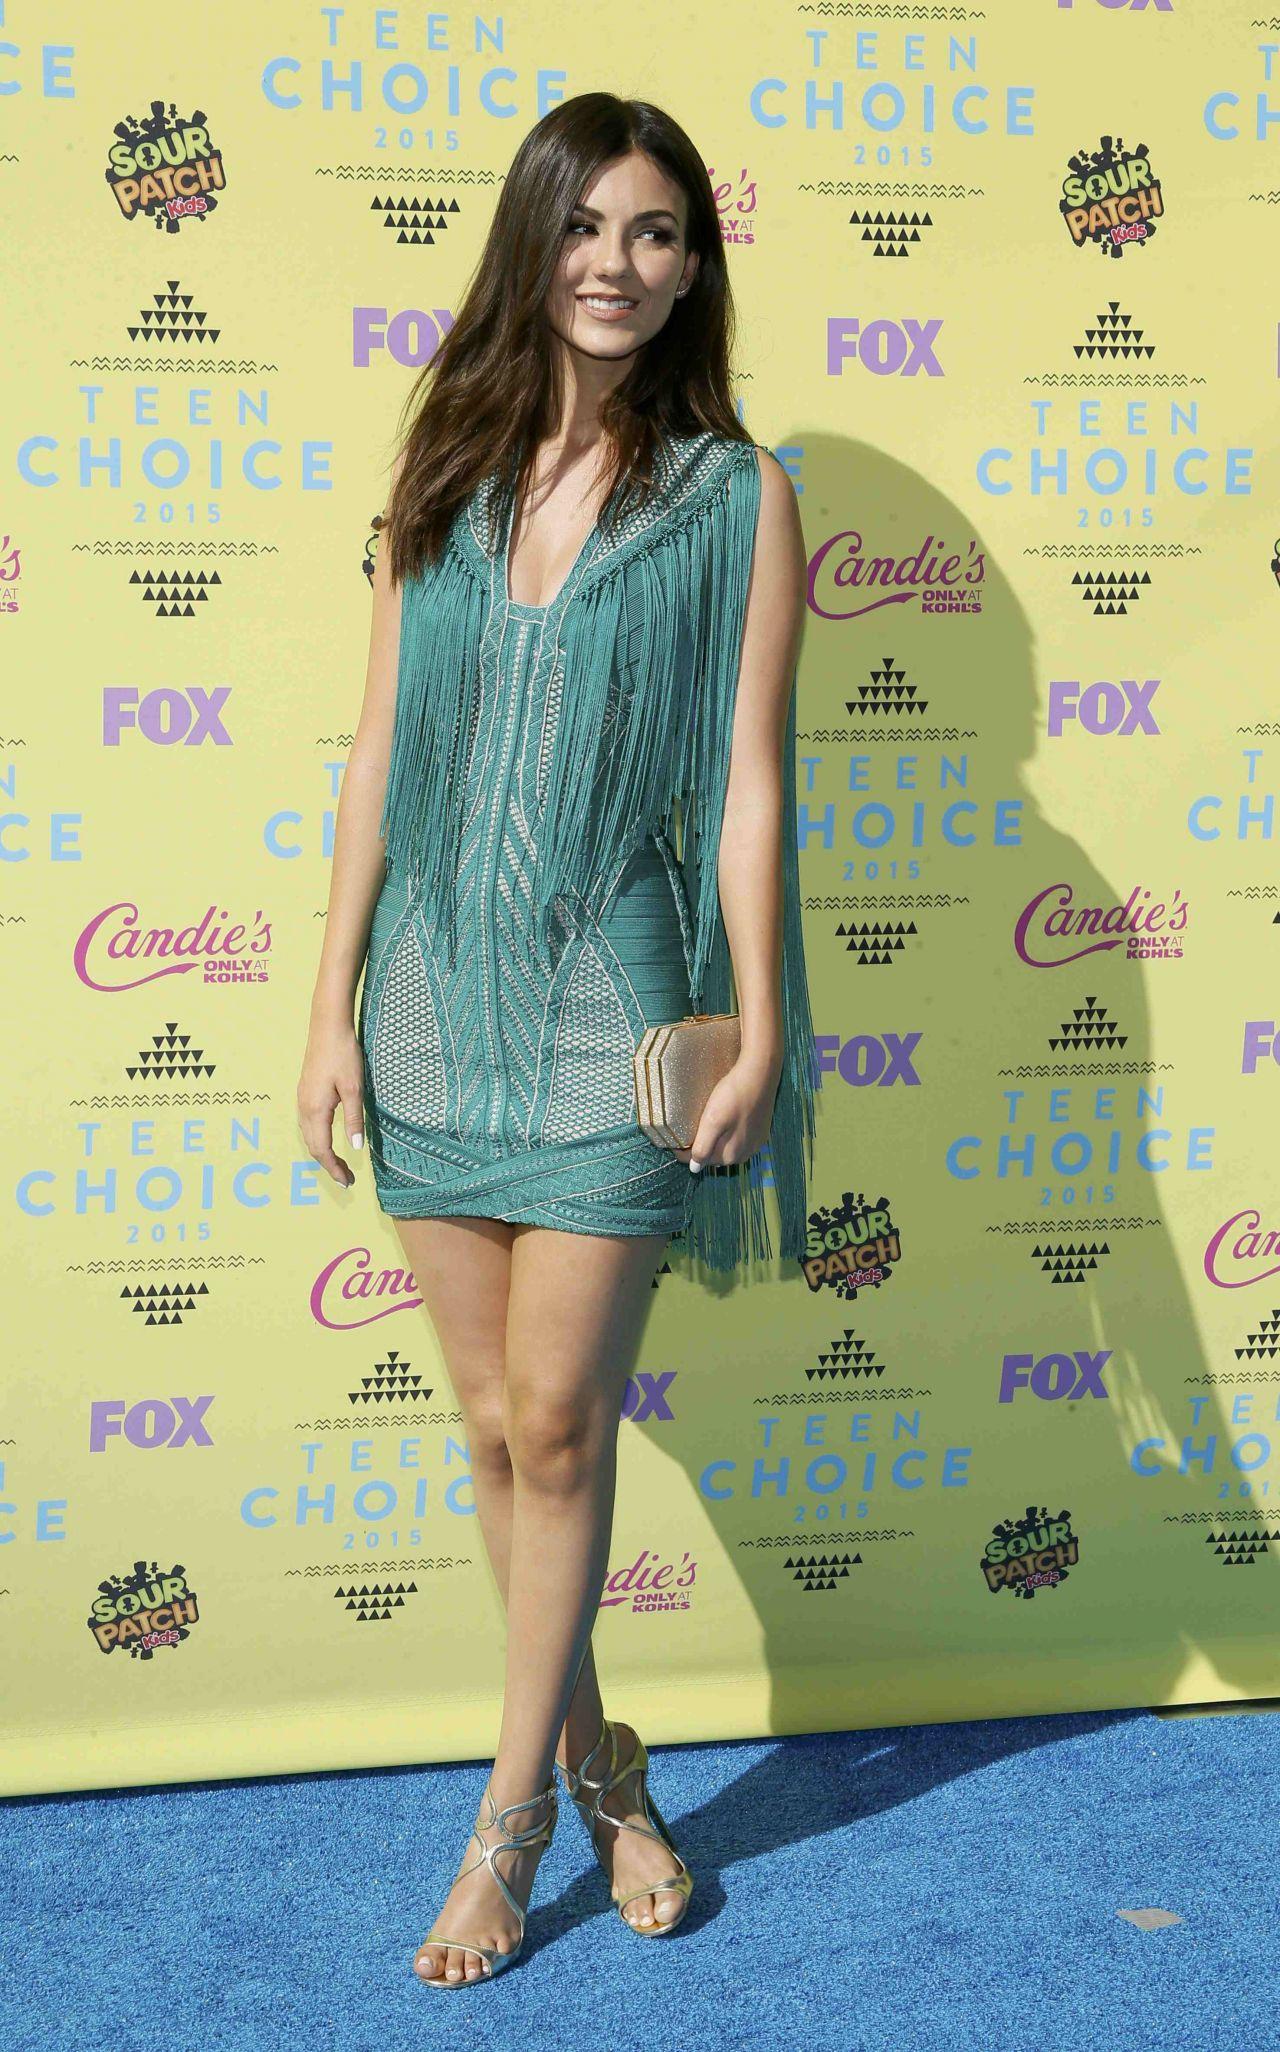 Teen choice awards photo